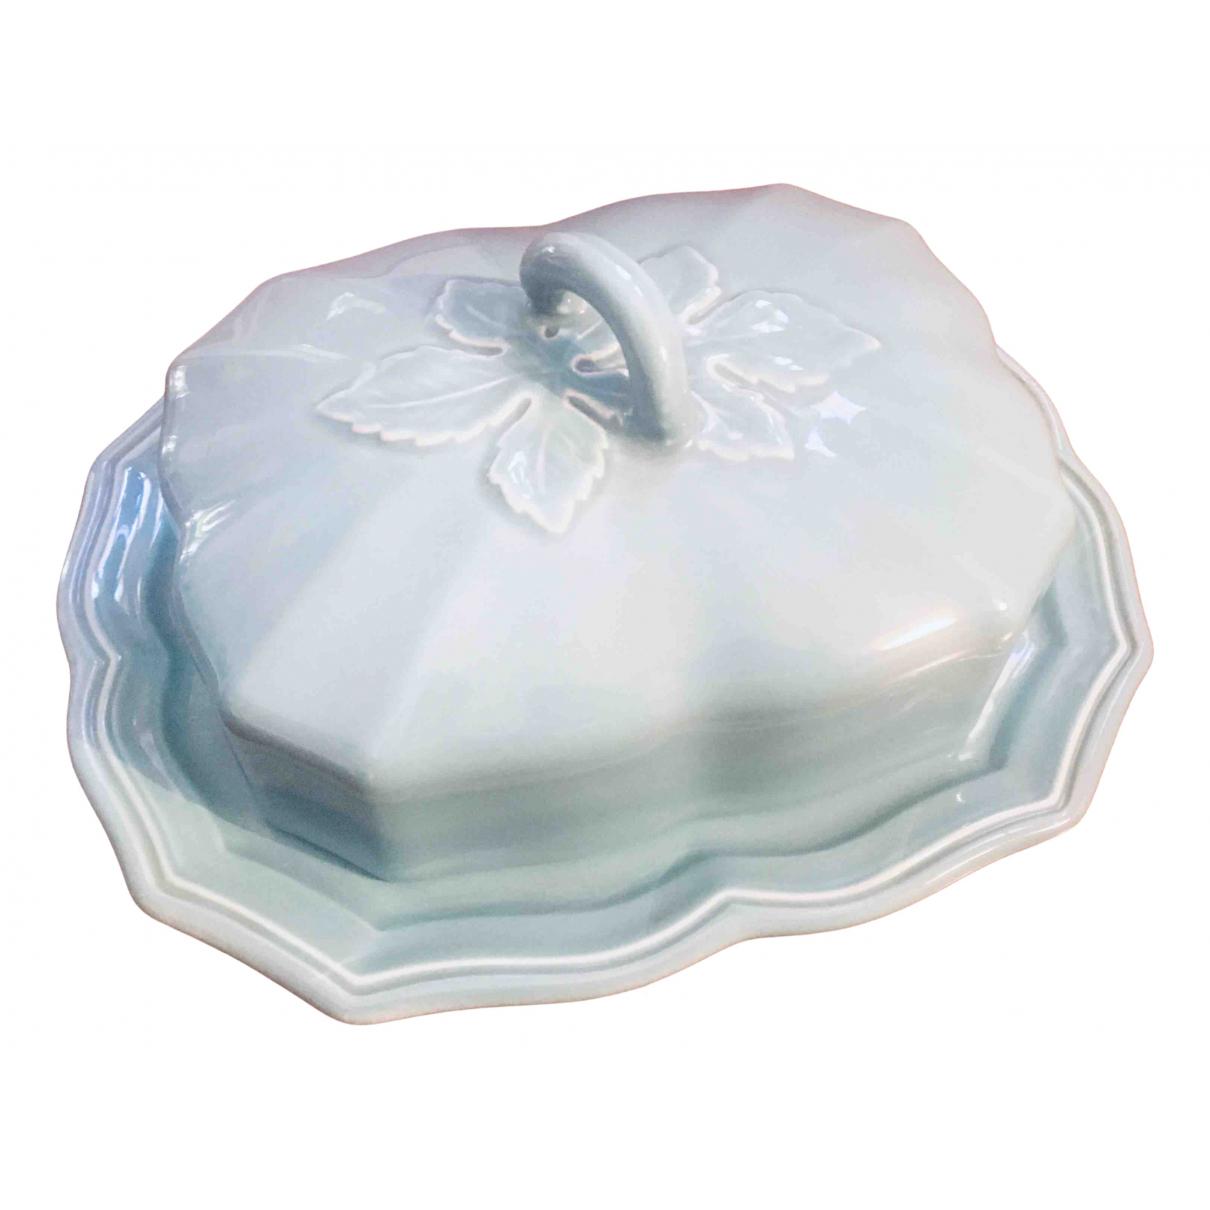 Menaje de mesa de Ceramica Non Signe / Unsigned